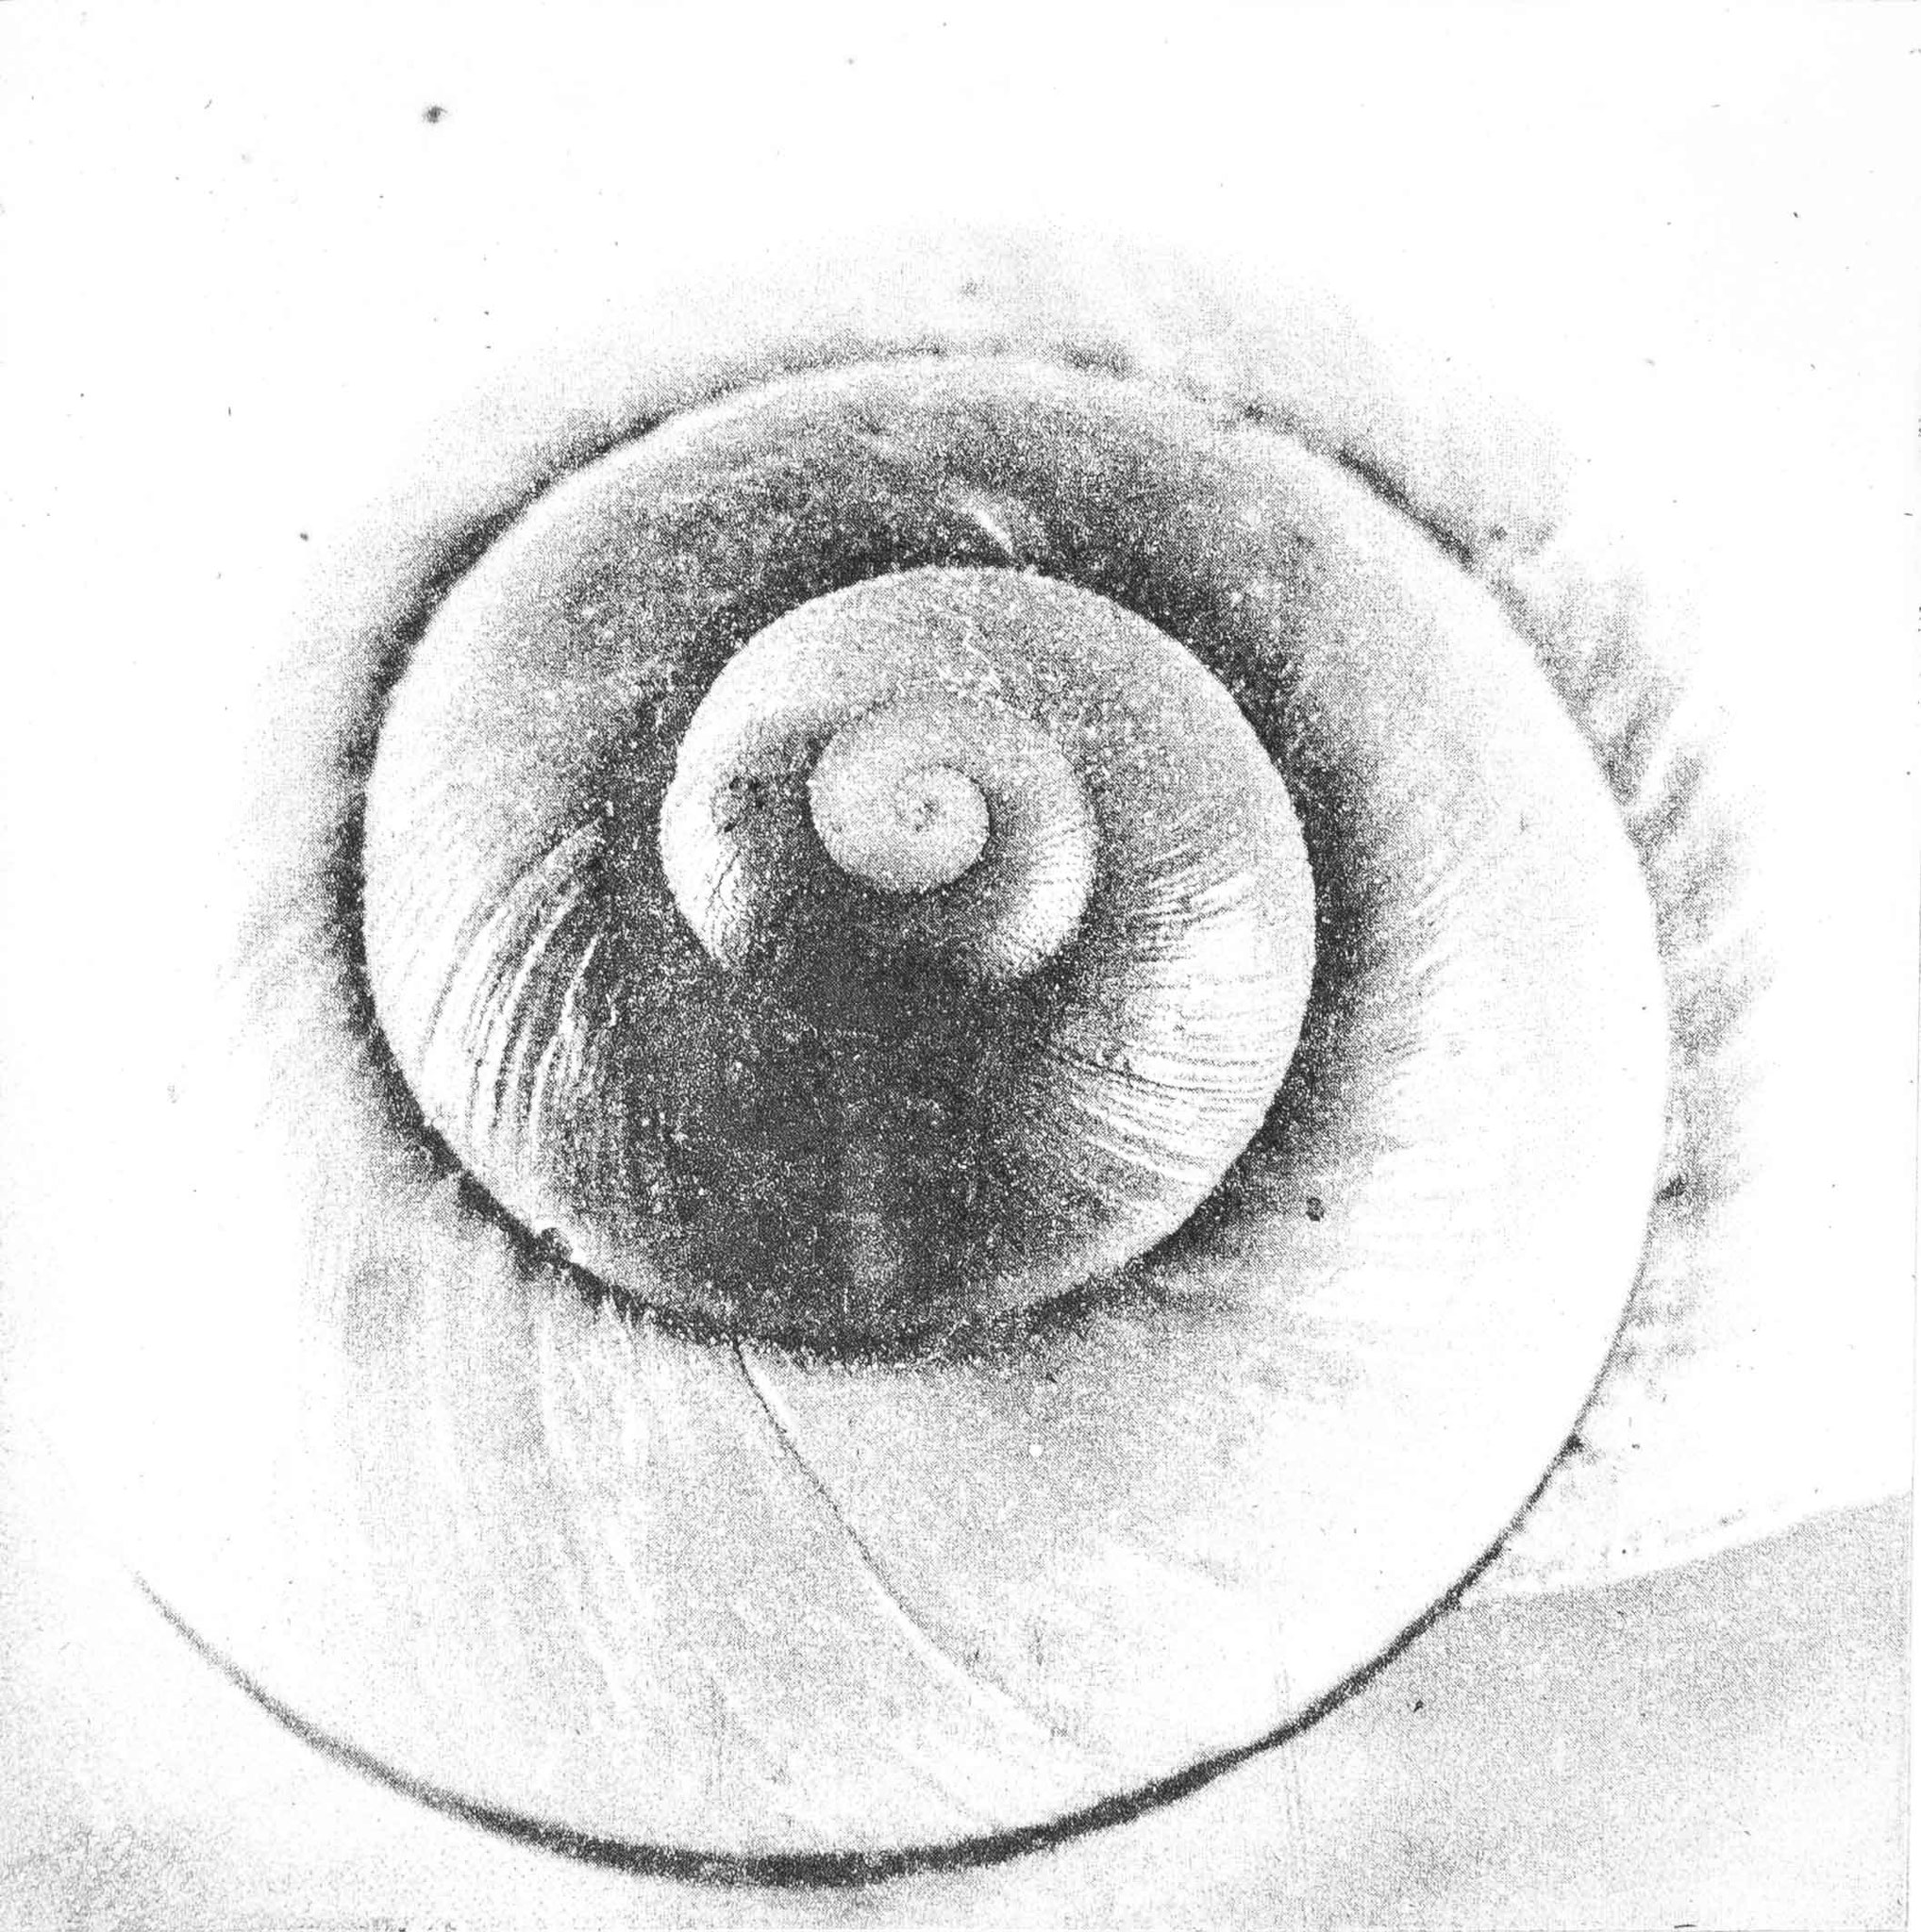 Intagliotypie, 20x30 cm, Meerhäuser